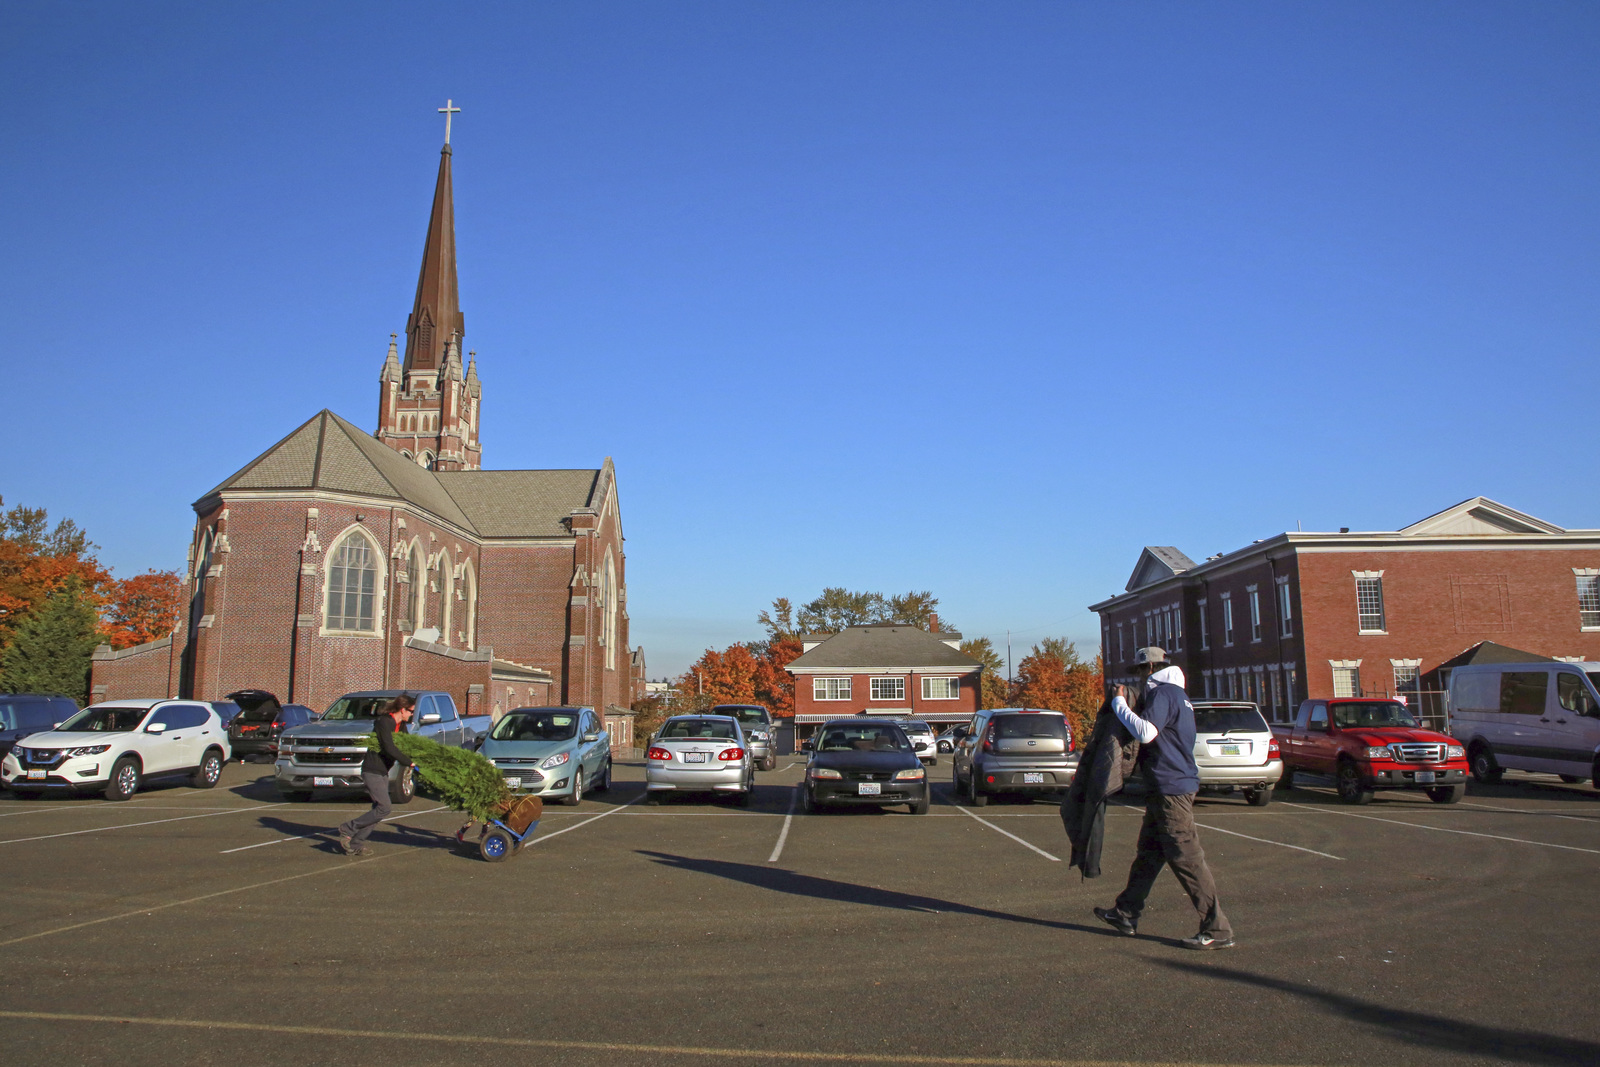 A view of the Holy Rosary church and school. Photo ©Marissa Singleton / TNC